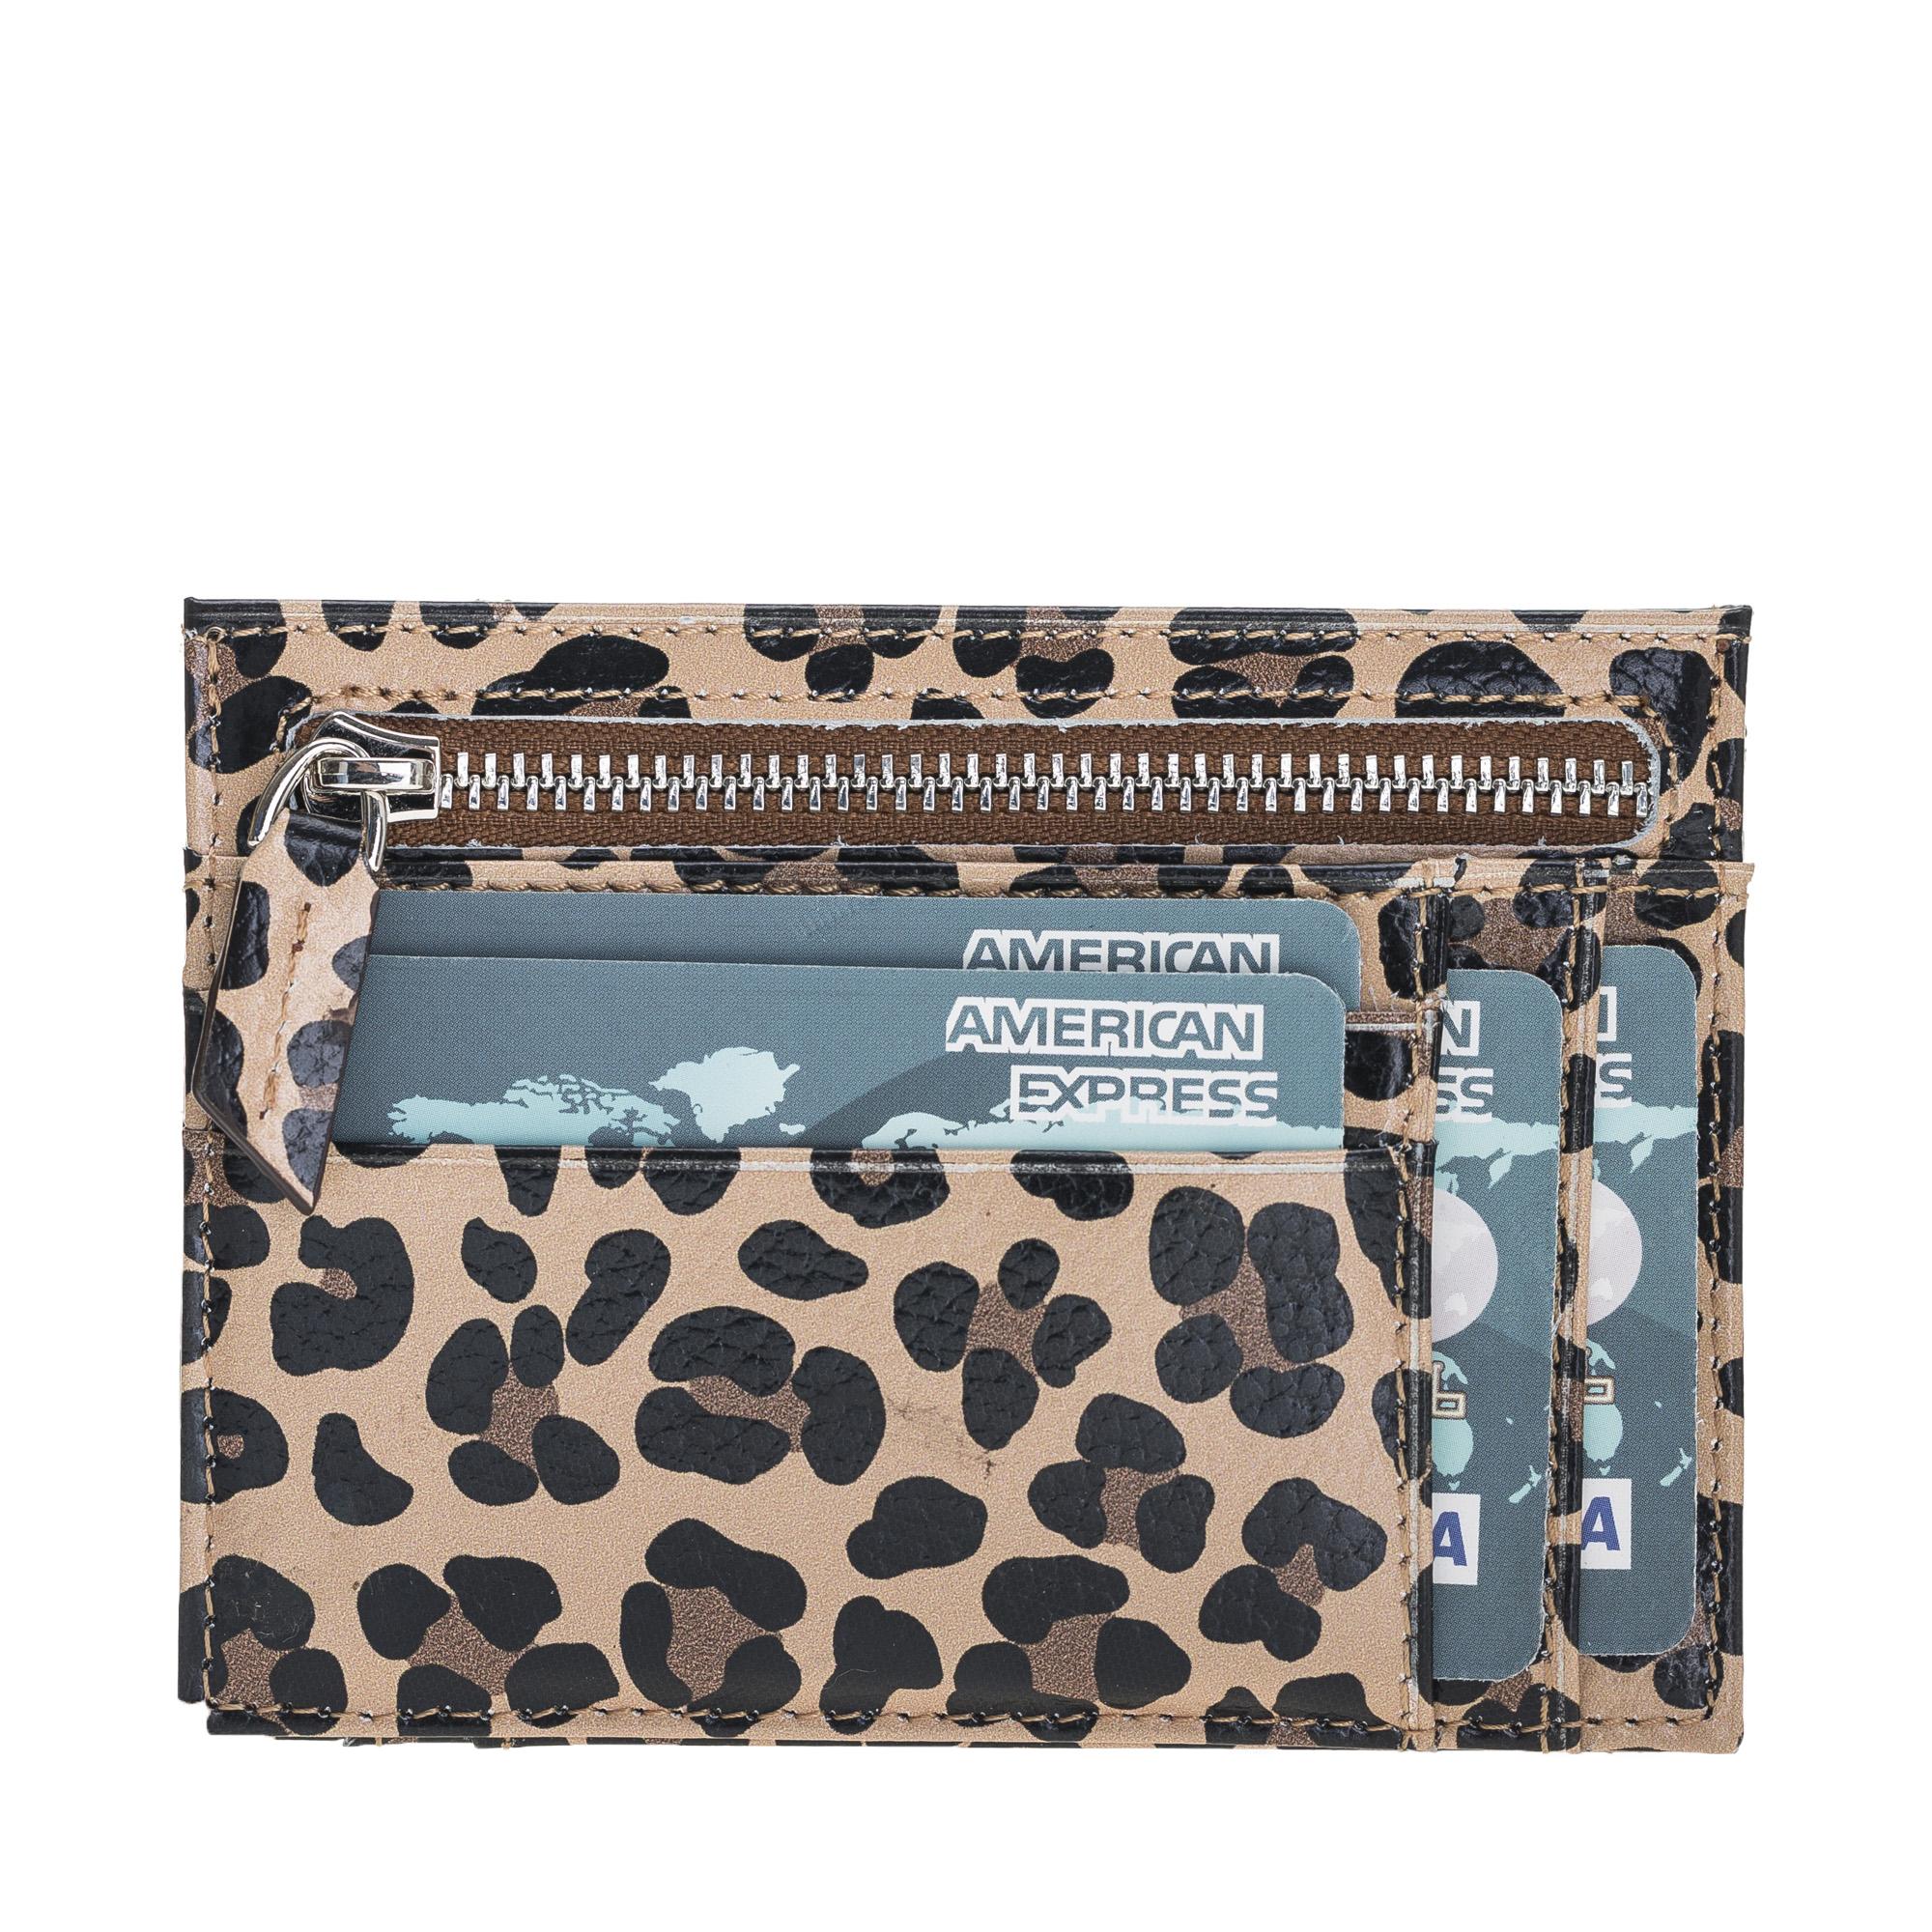 Leopard Patterned Premium  Genuine Leather  Zip Card Holder